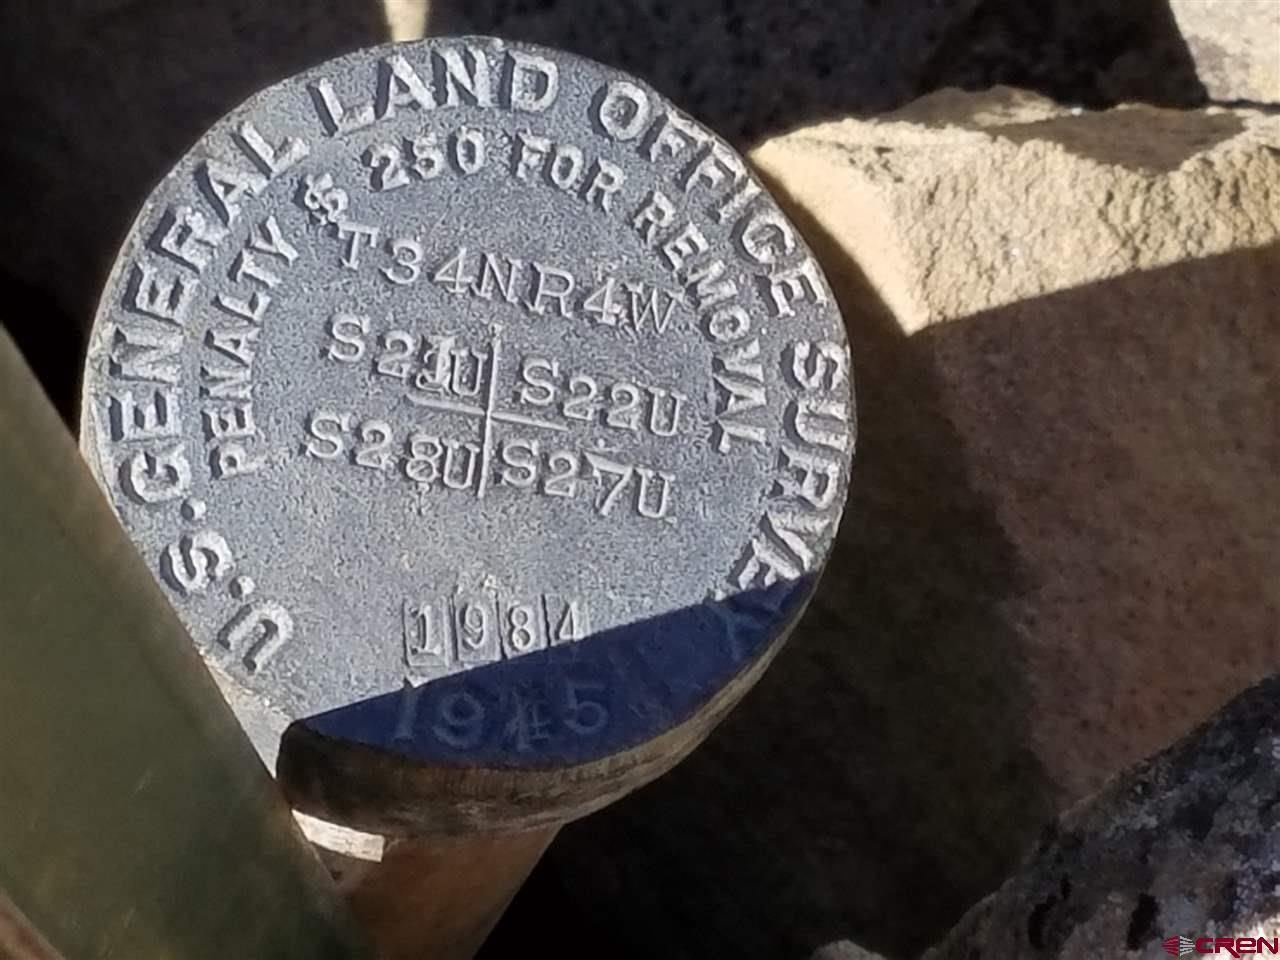 X Chimney Rock Ridge Road, Pagosa Springs, CO 81147